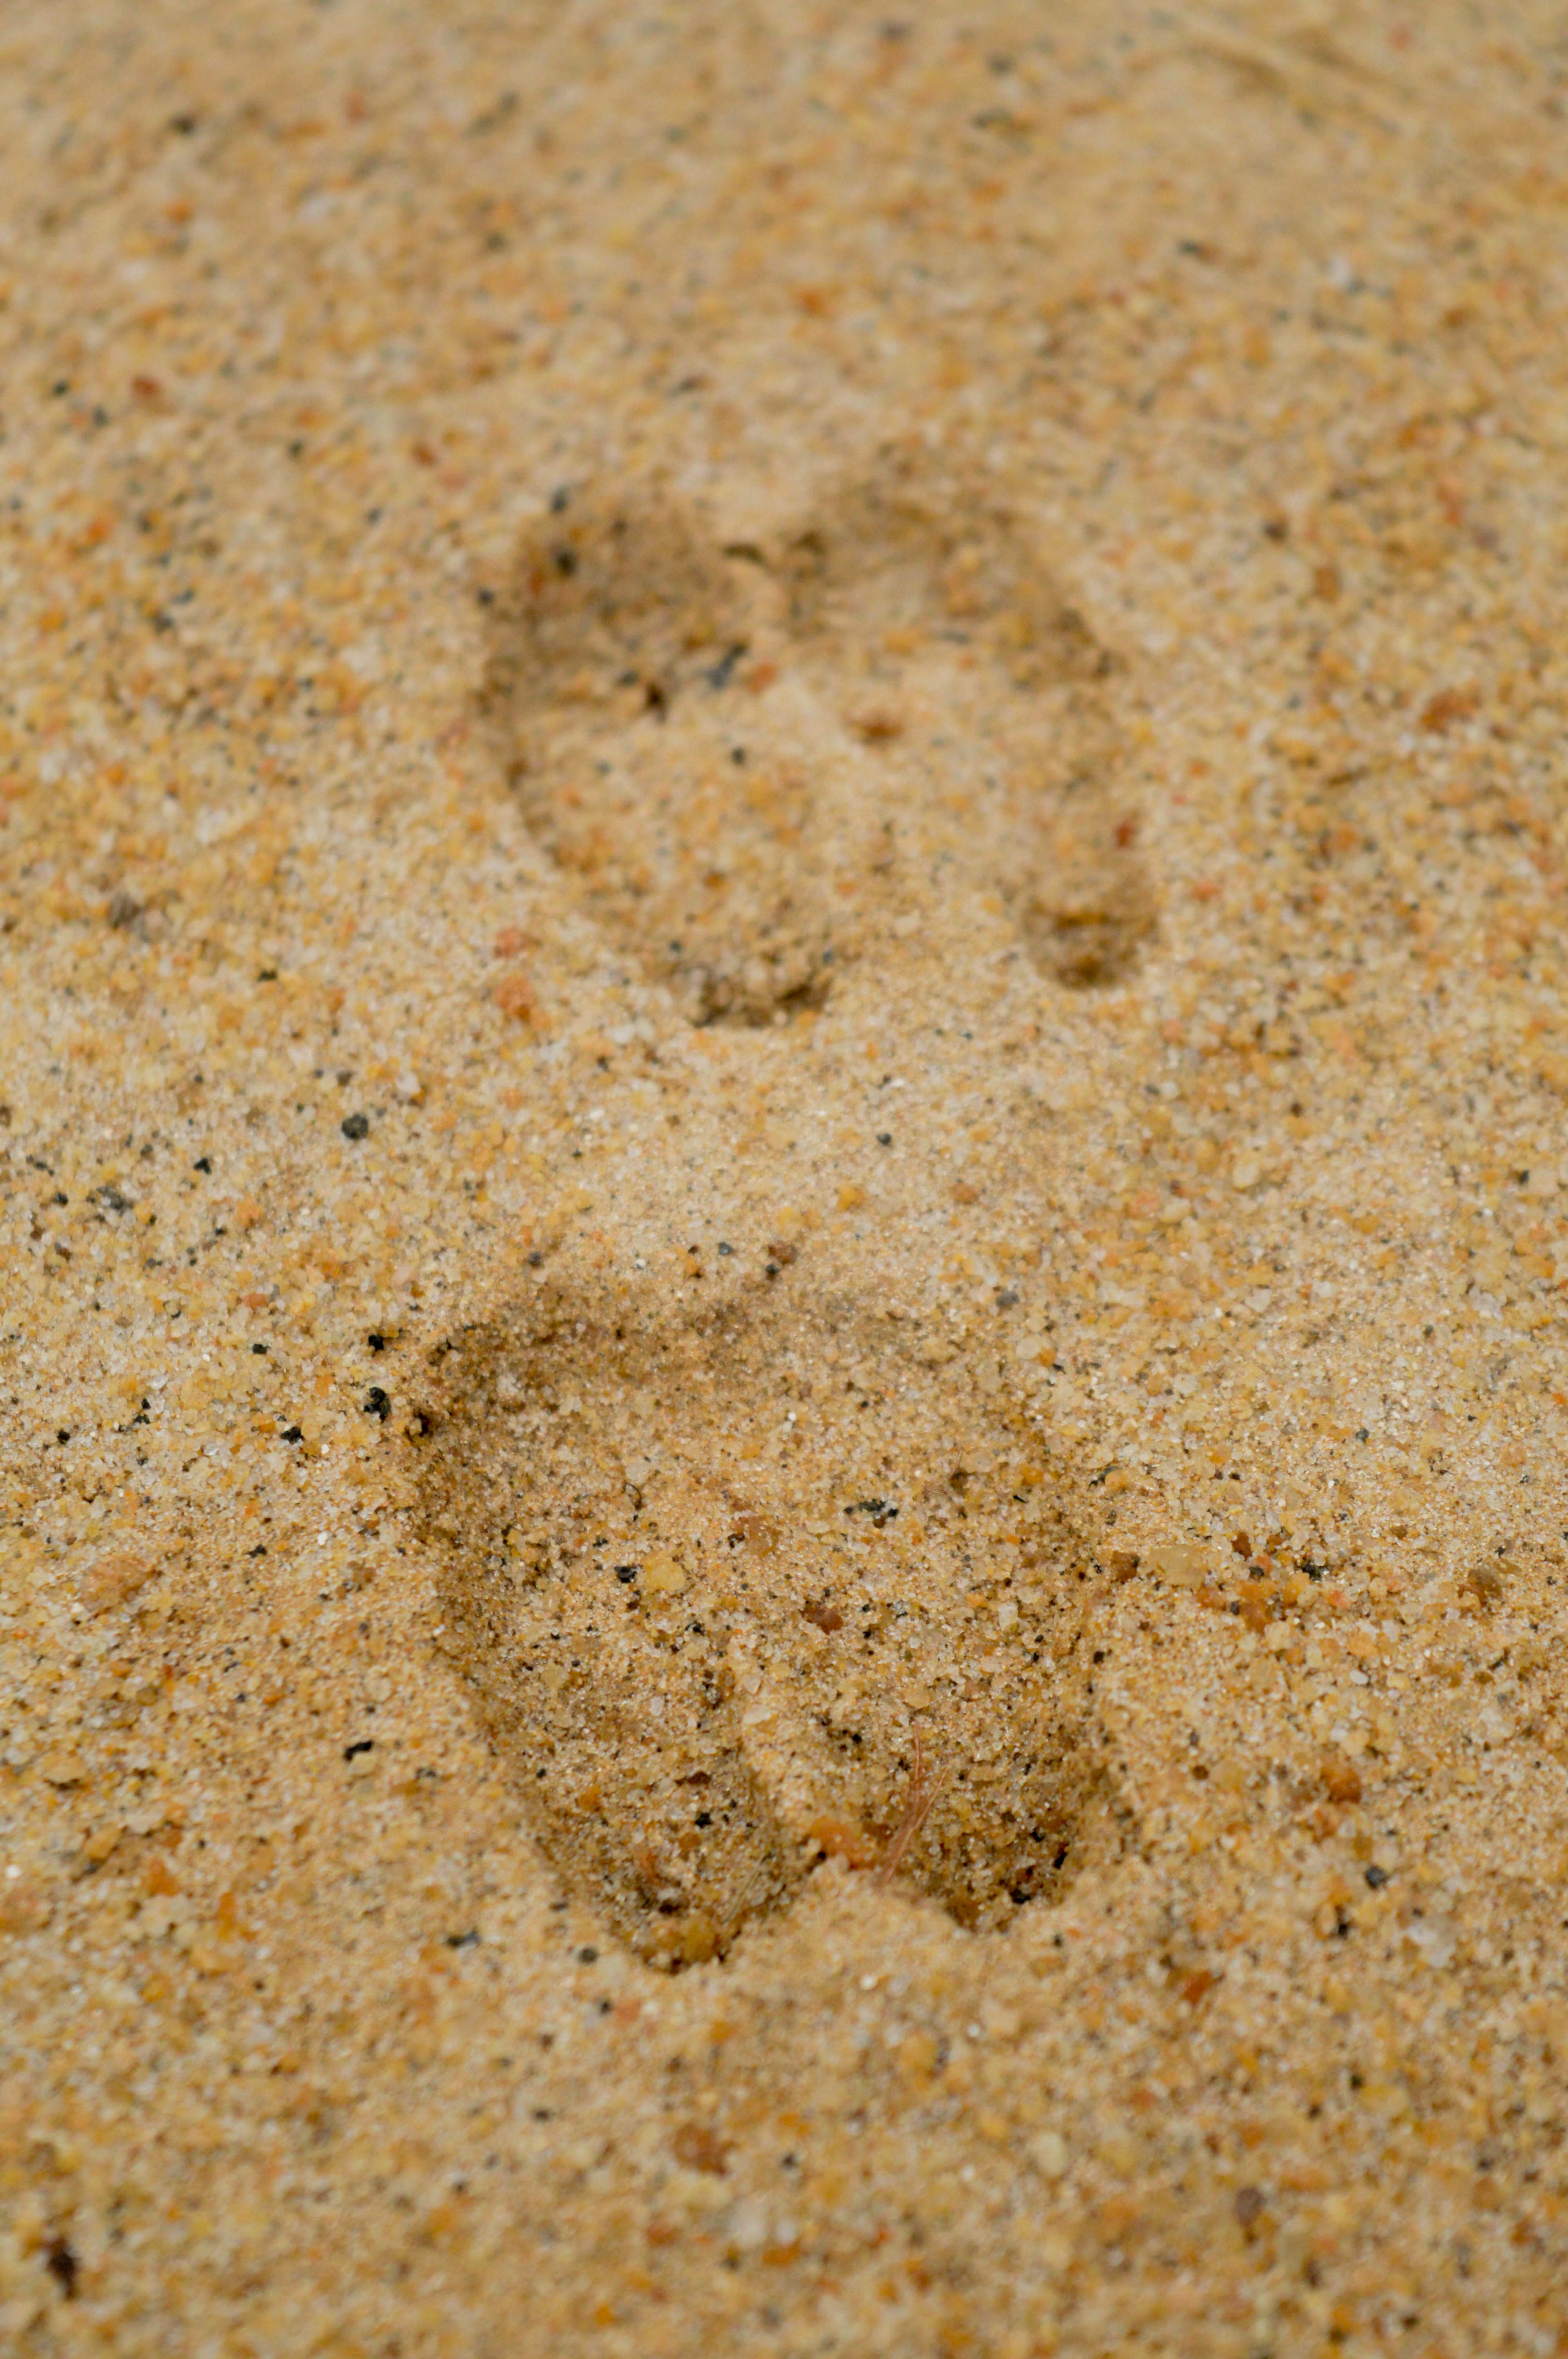 Prints, Step, Sand, Print, Foot, HQ Photo